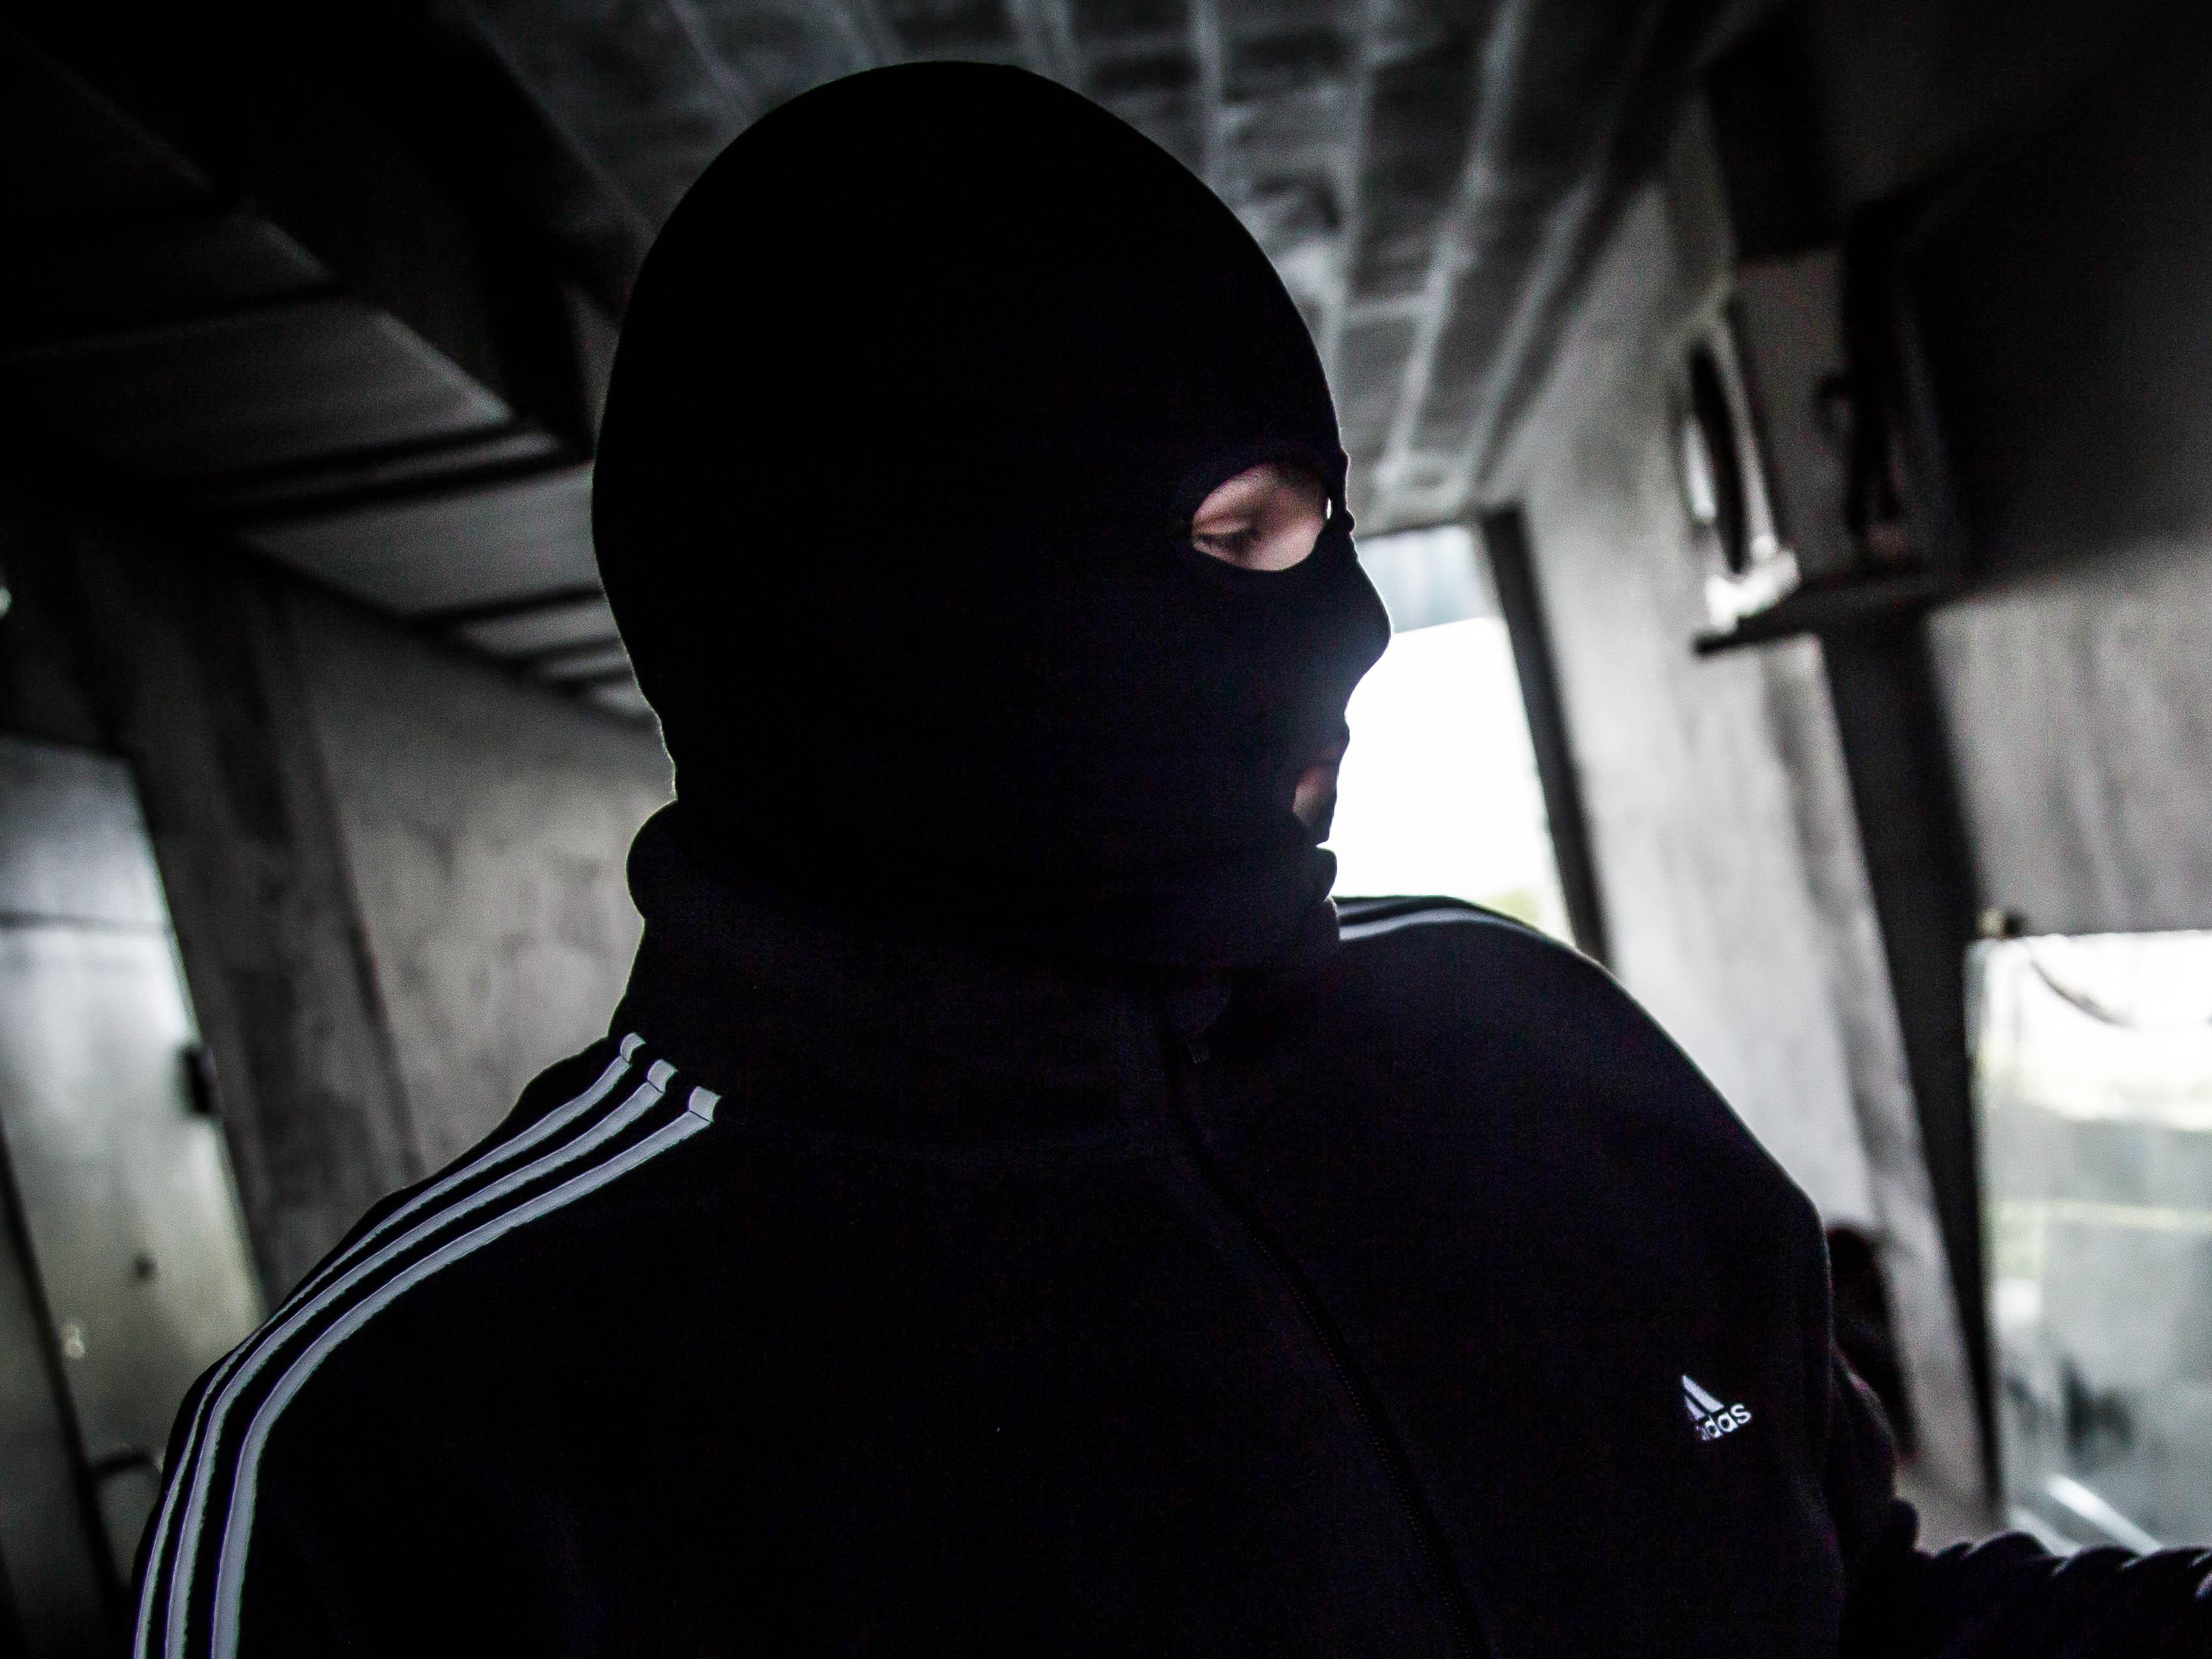 Бандит картинка в маске